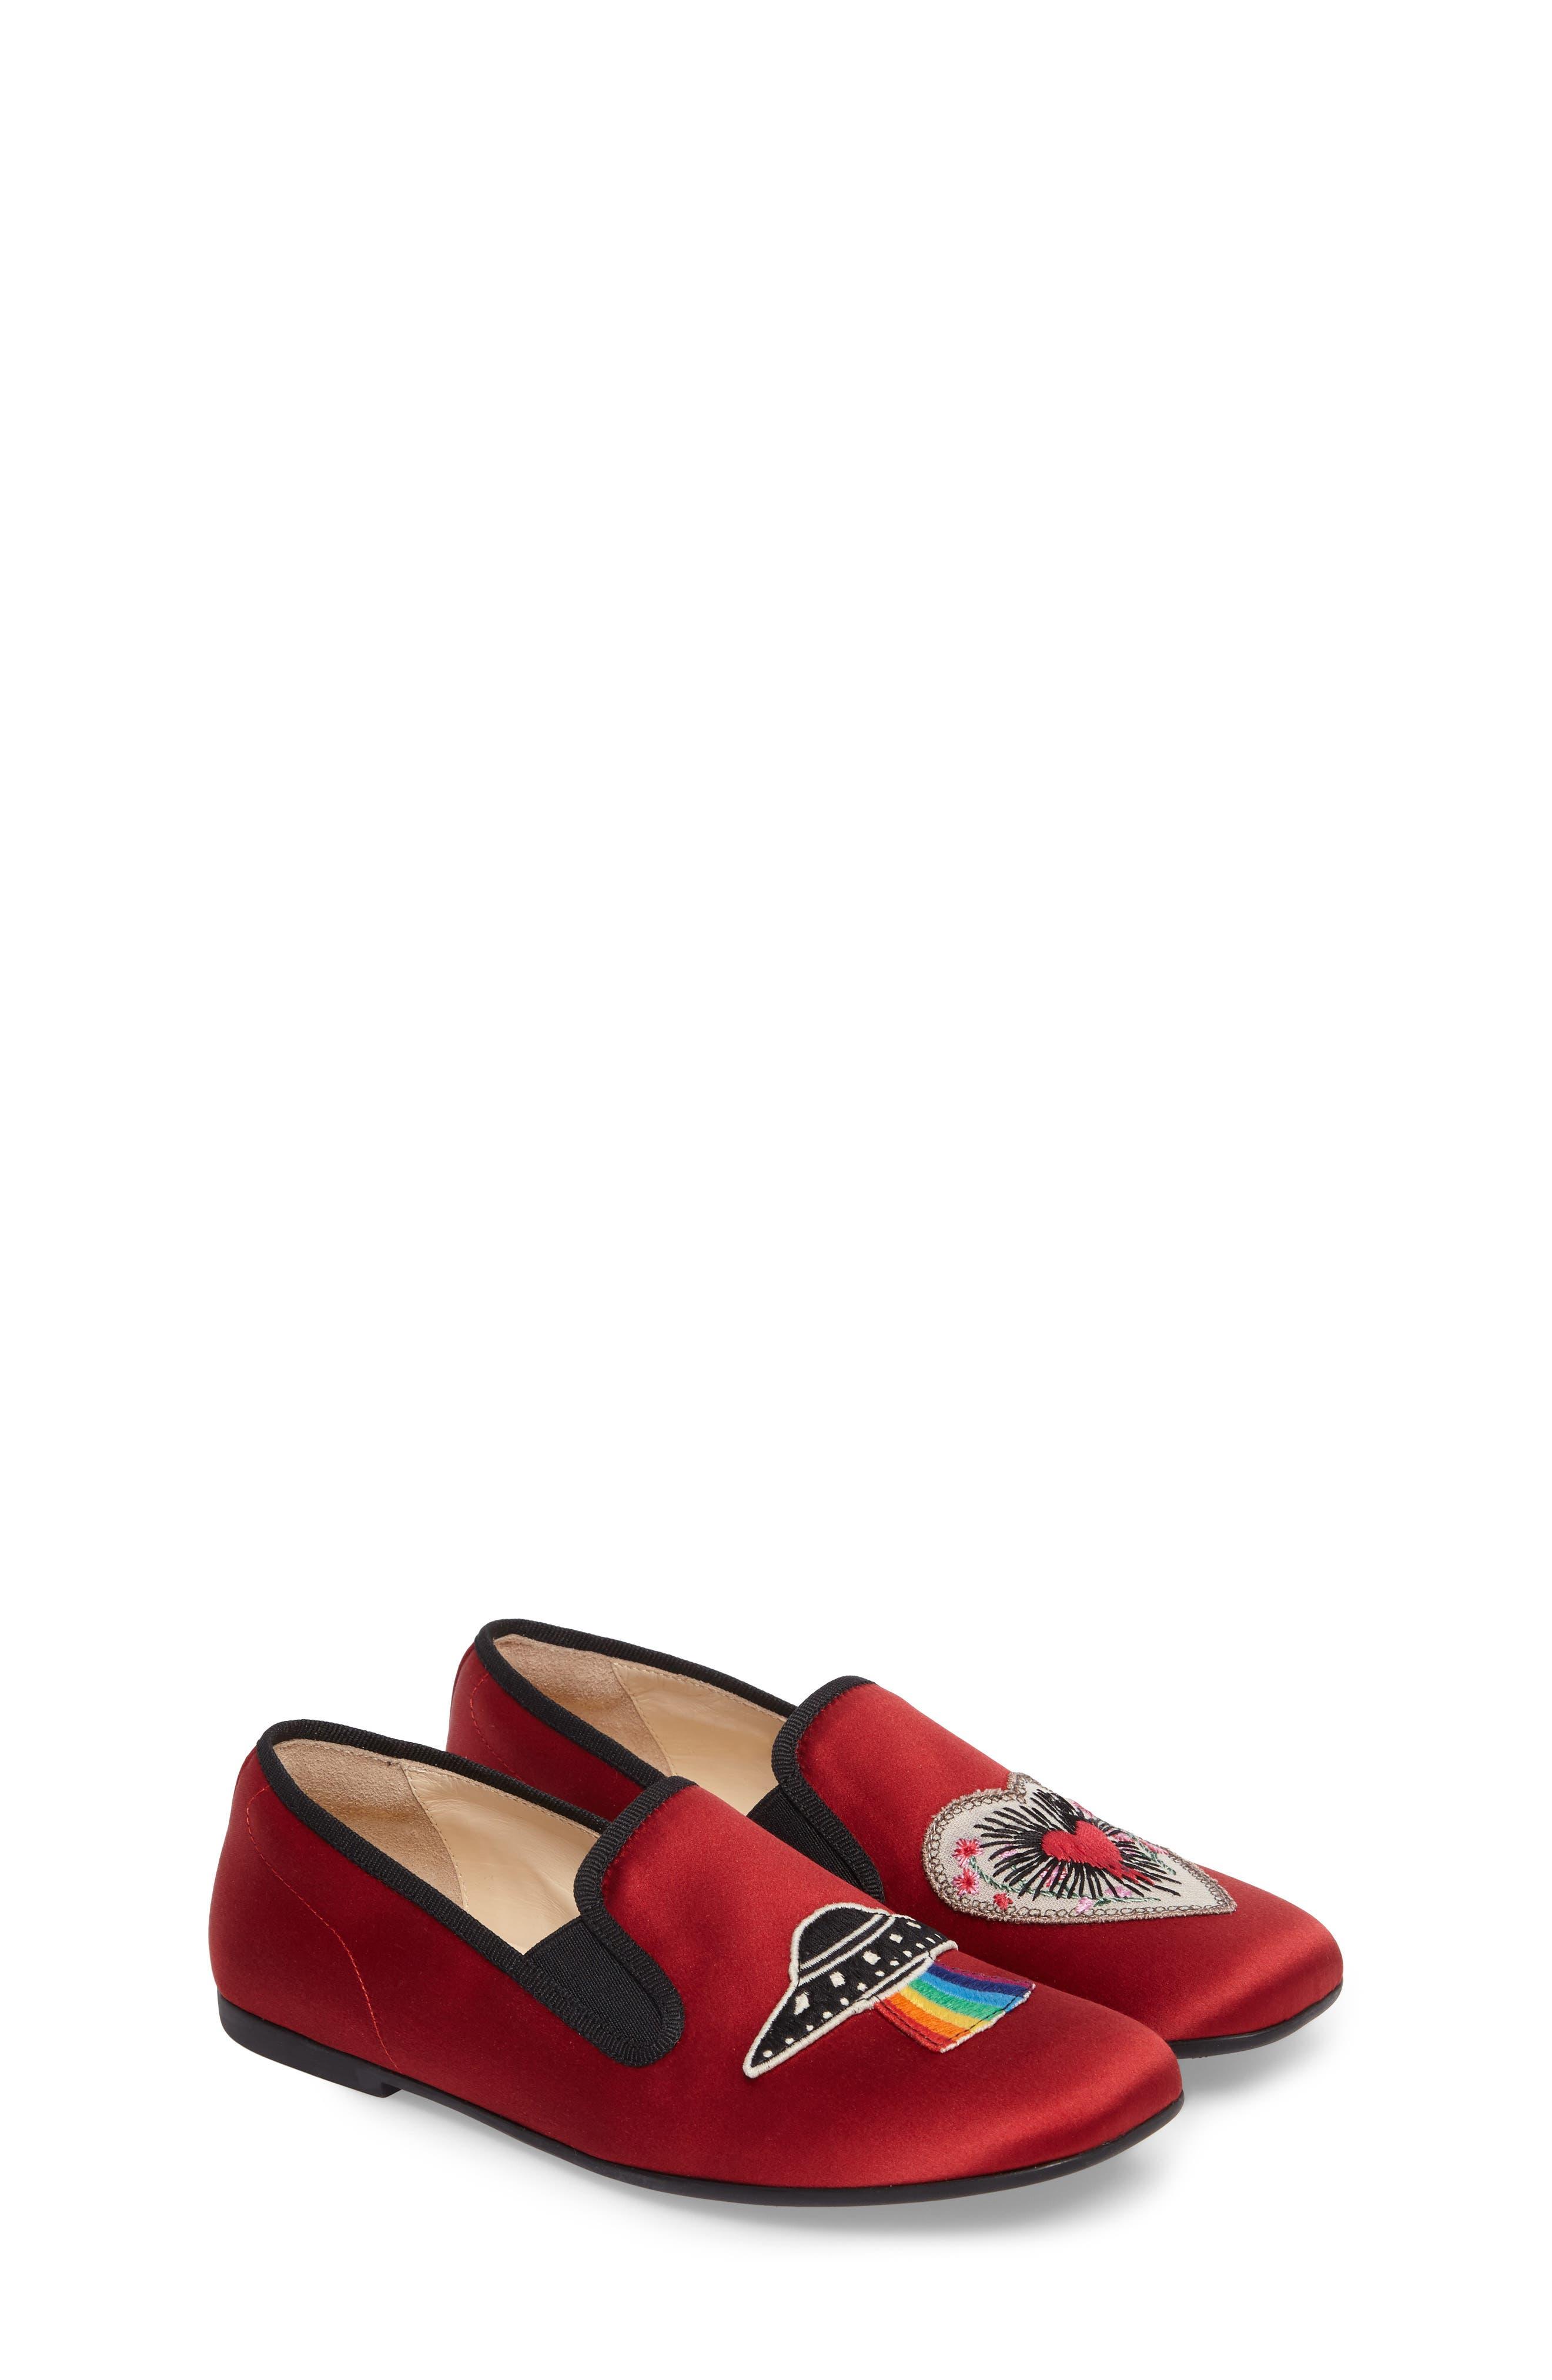 Nannie Appliqué Loafer Flat,                         Main,                         color, Red